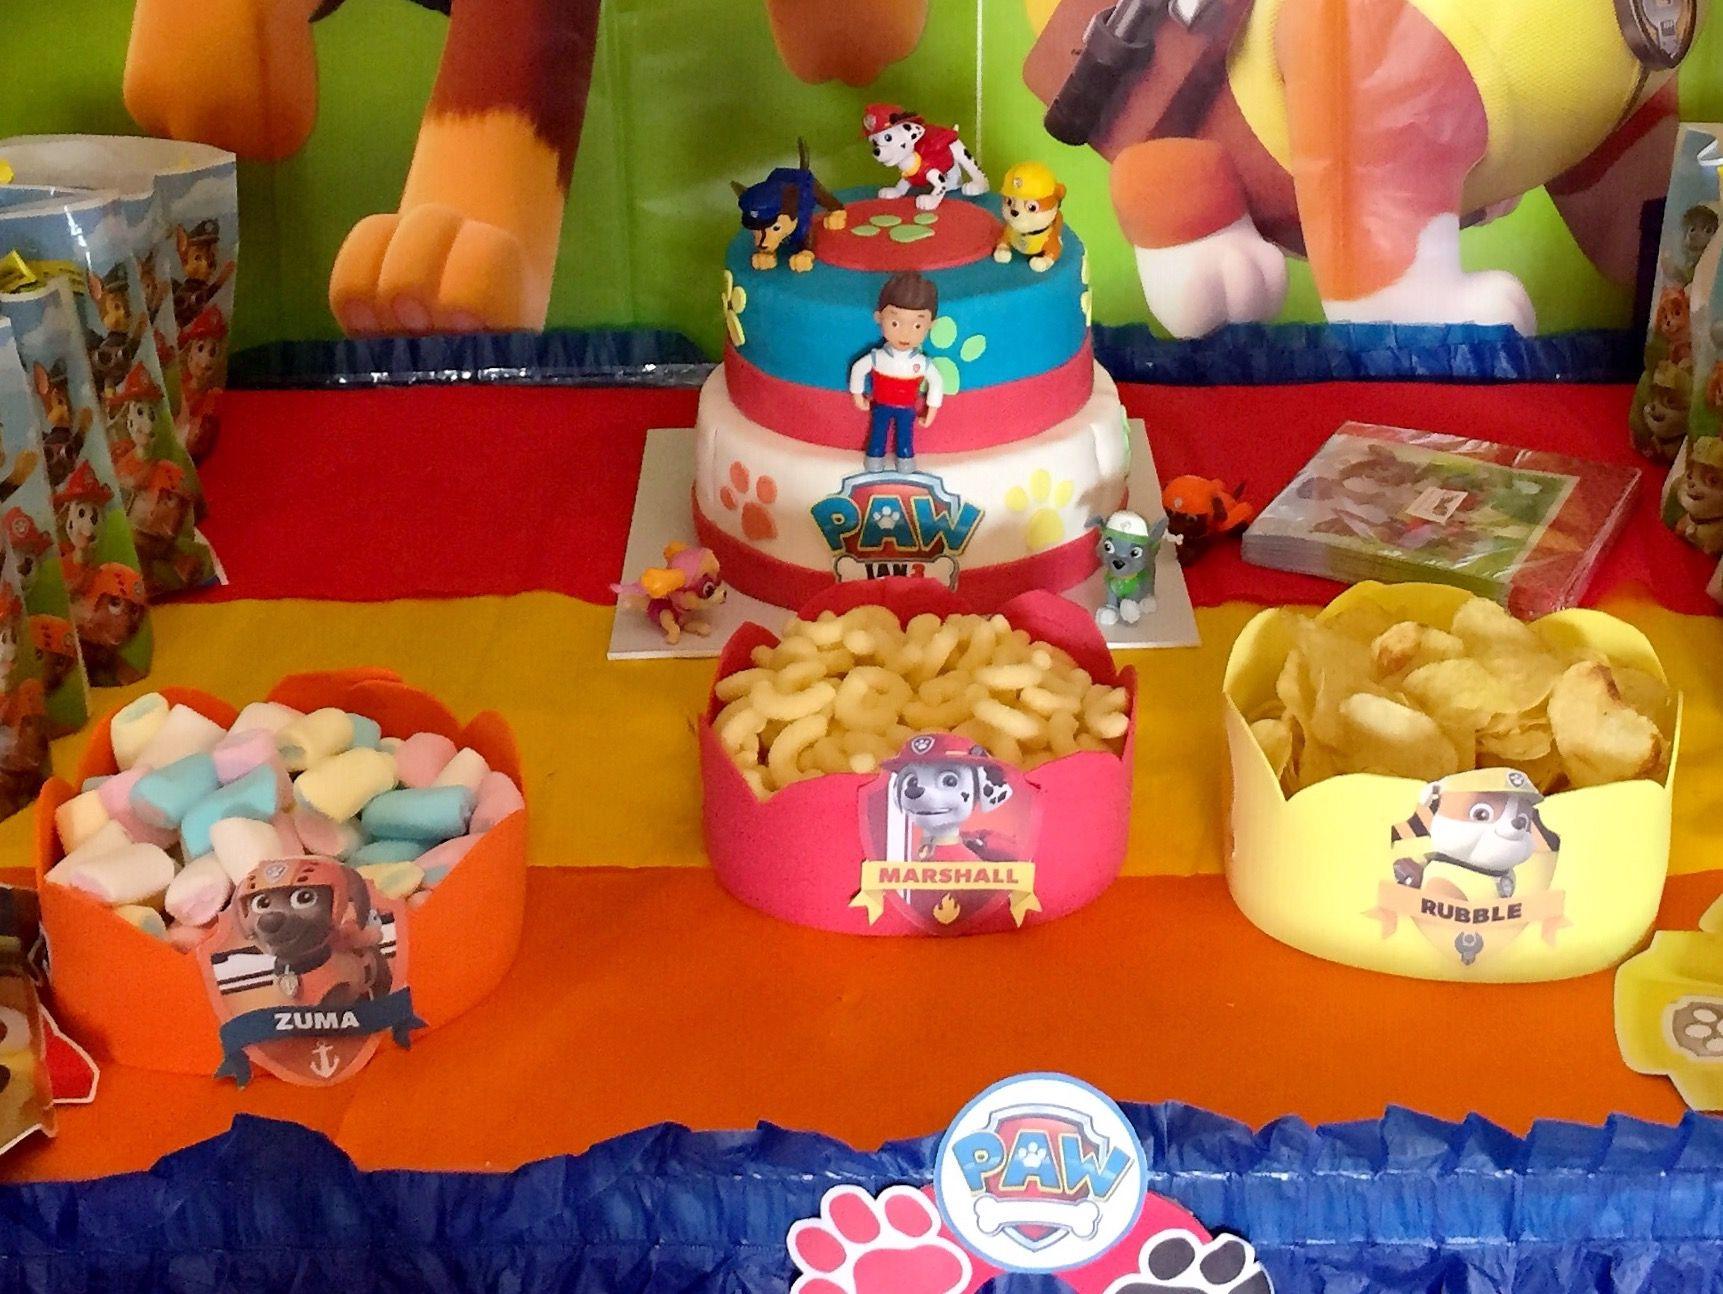 patrulla canina decoracin cumpleaos infantil ideas paw patrol birthday party - Ideas Cumpleaos